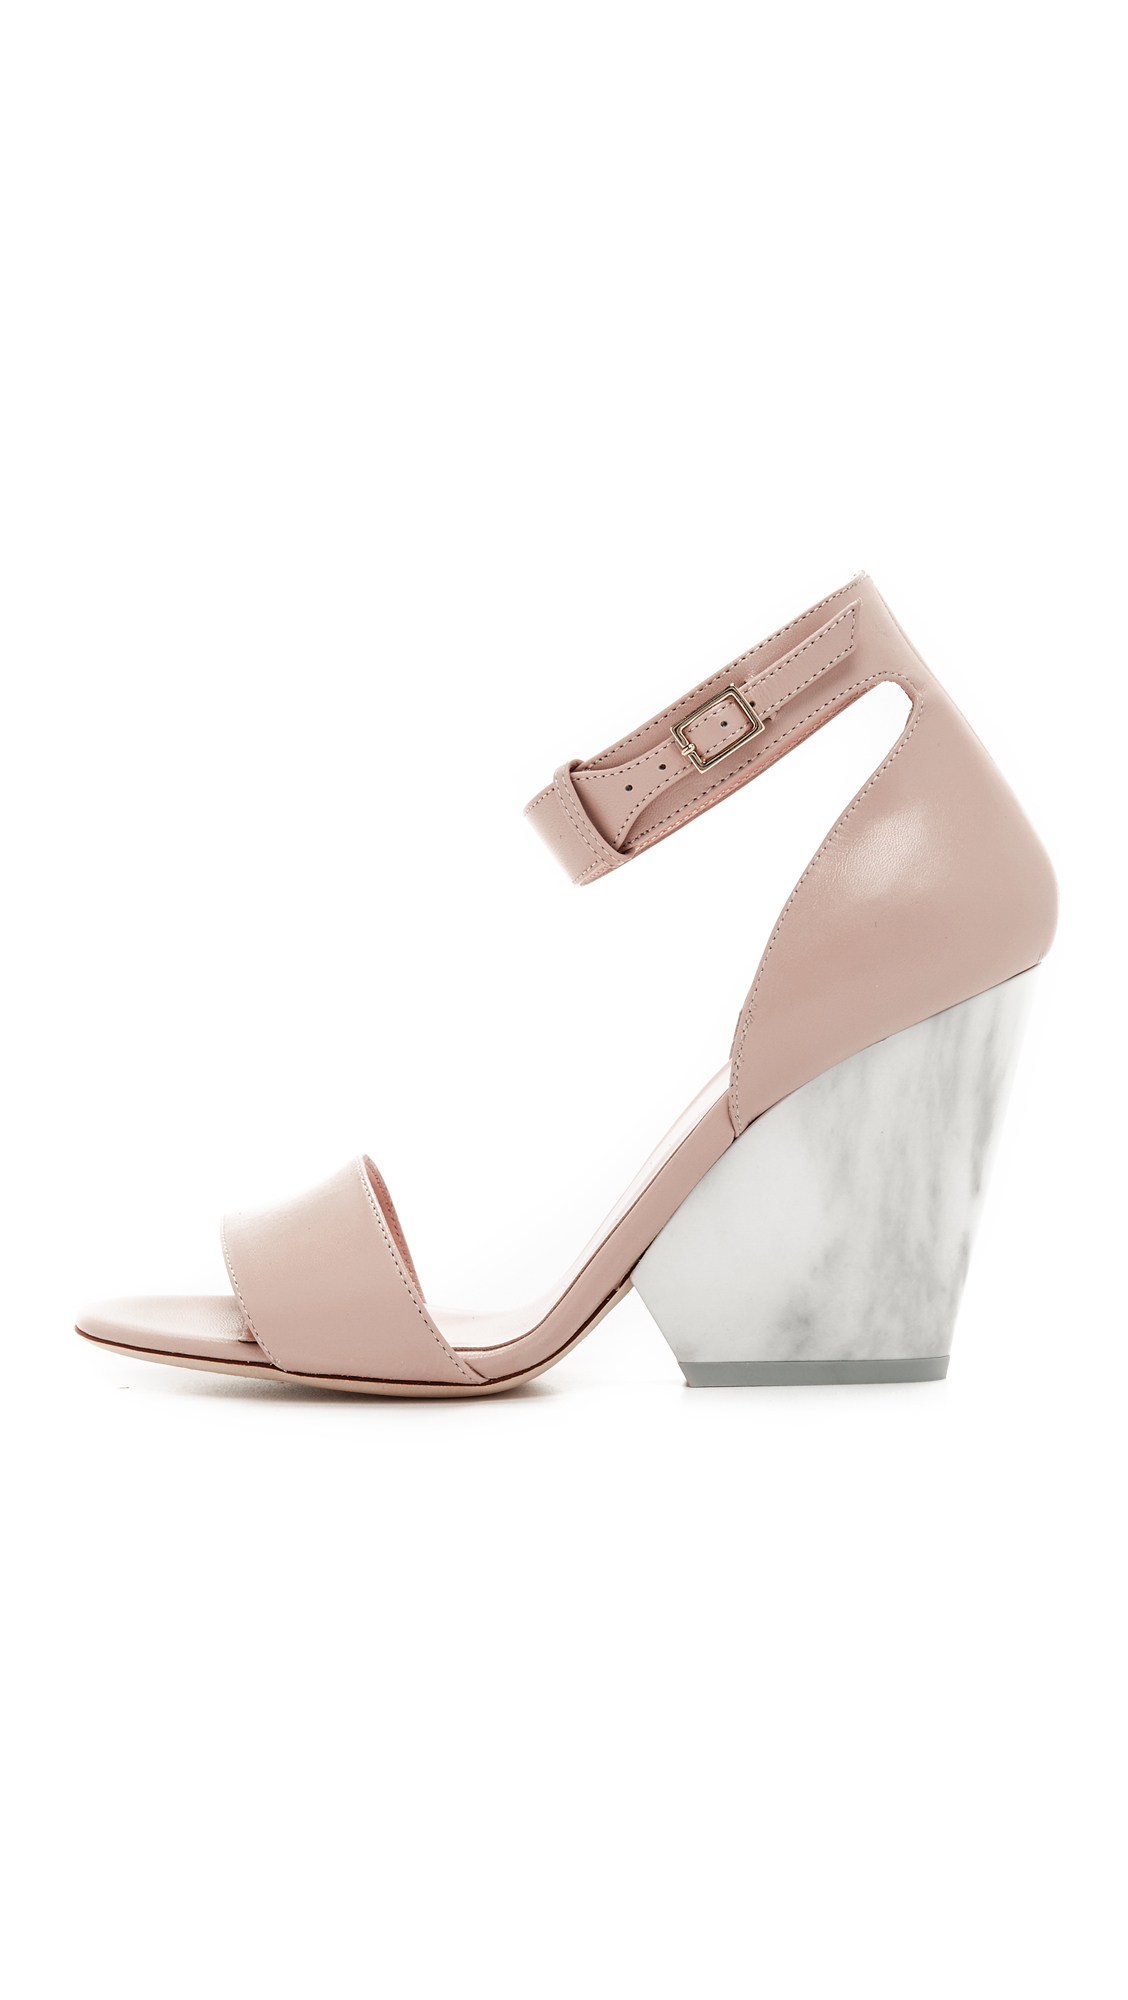 Kate Spade New York Crossover Platform Sandals buy cheap visit TWVQ1XCU